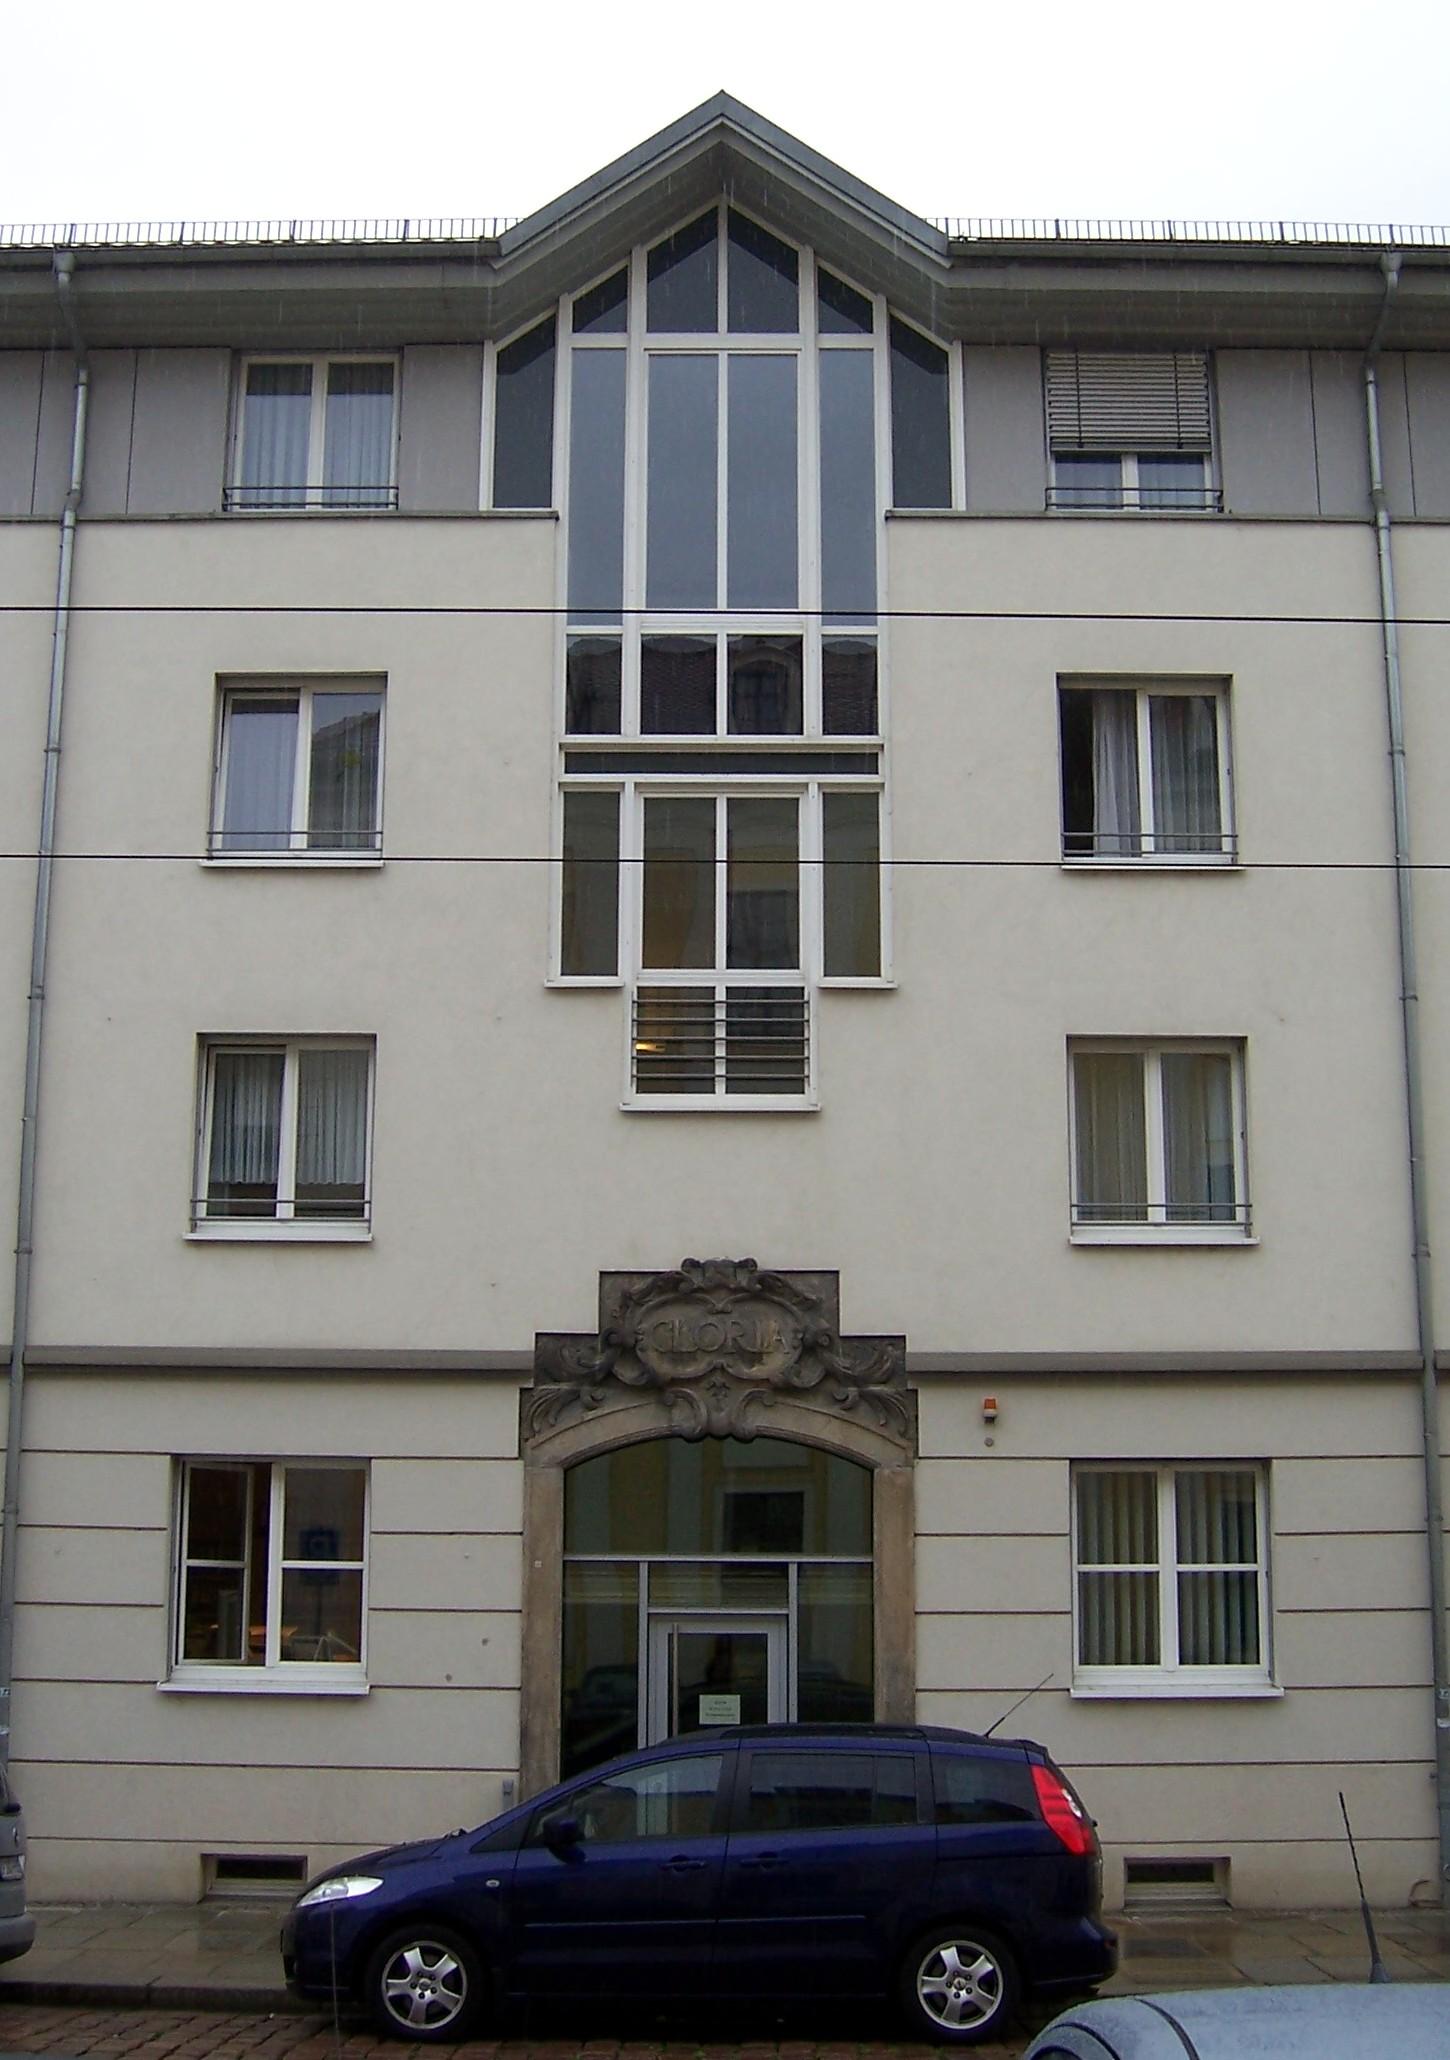 Liste der barockbauten in dresden - Haus 69 ...